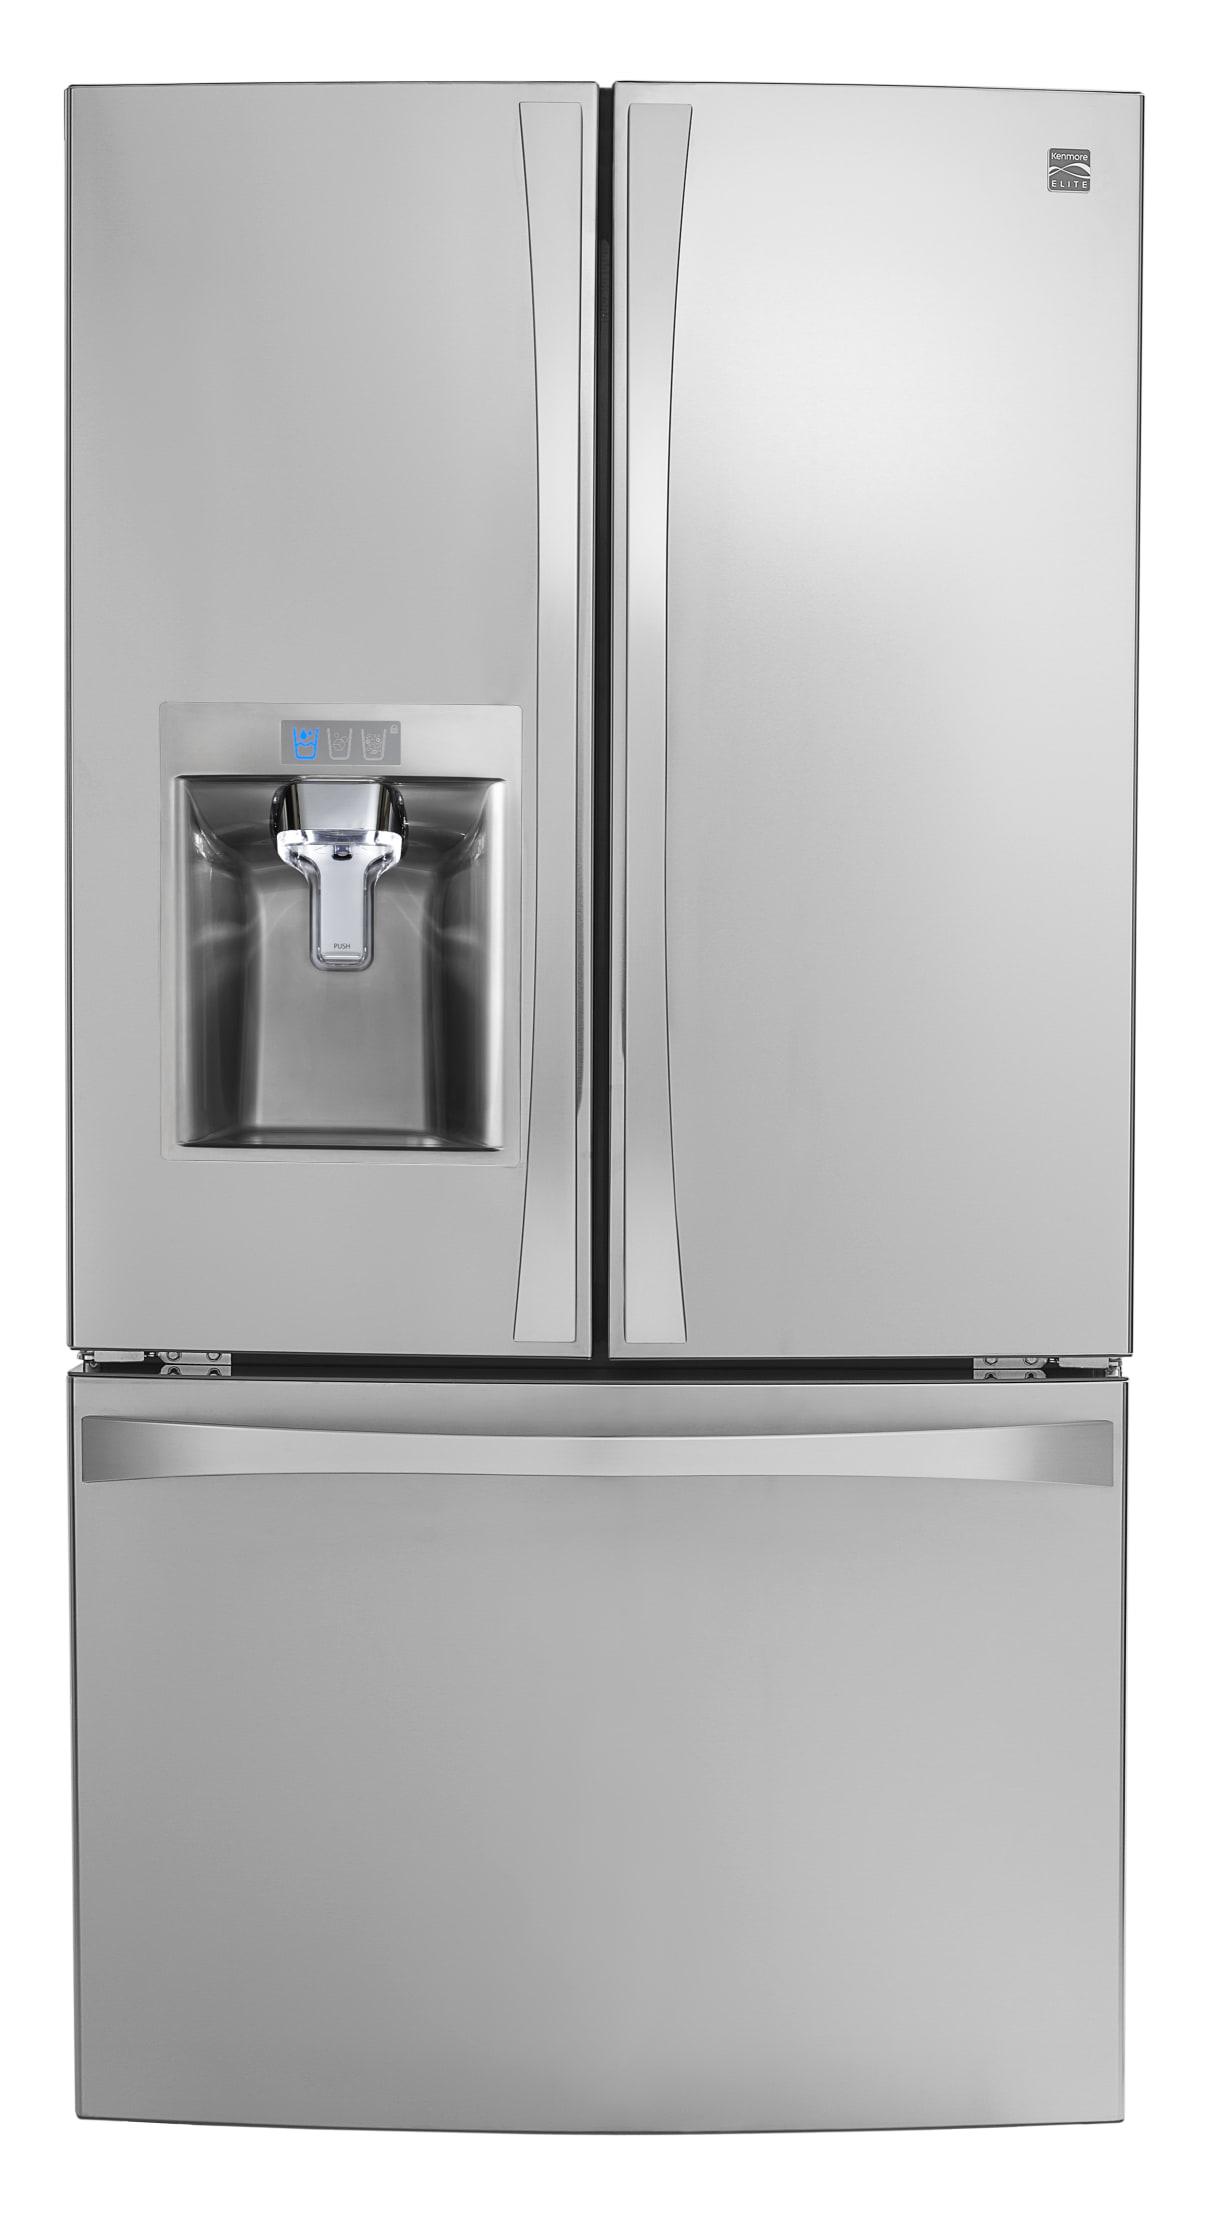 kenmore elite 596 refrigerator manual image refrigerator nabateans org rh nabateans org kenmore 596 manual defrost kenmore 596 service manual